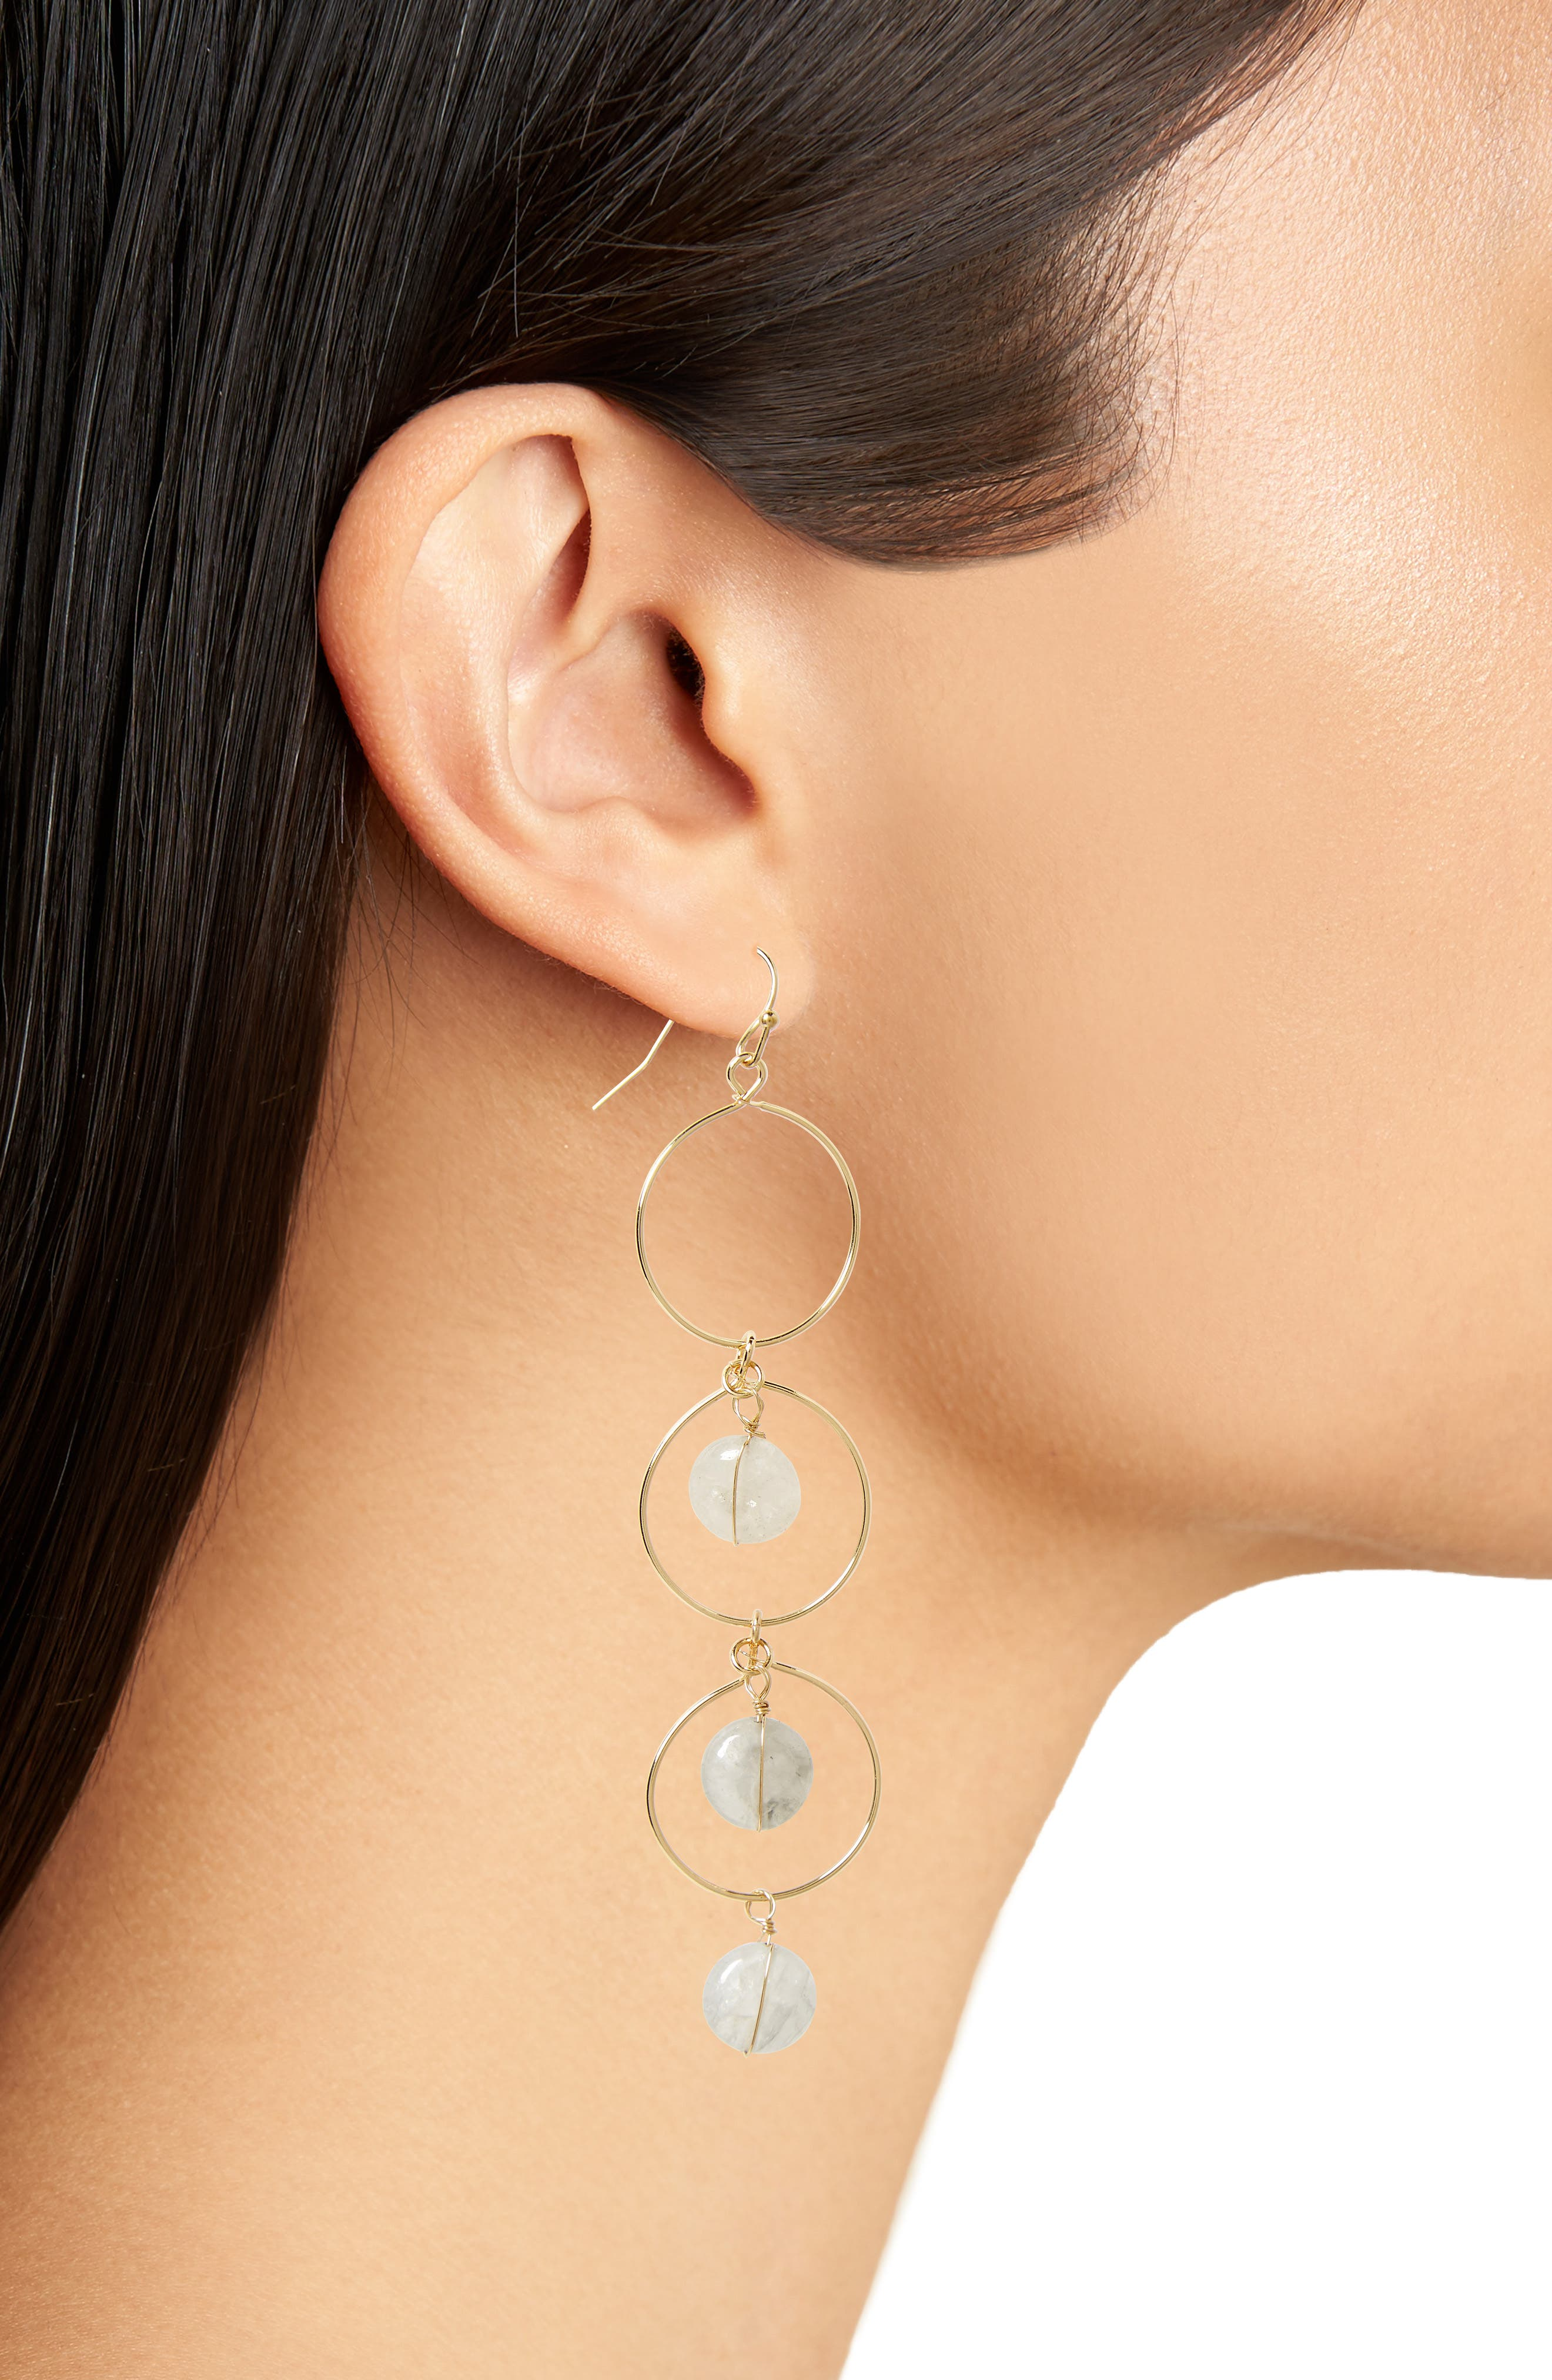 Circle Drop Earrings,                             Alternate thumbnail 2, color,                             020